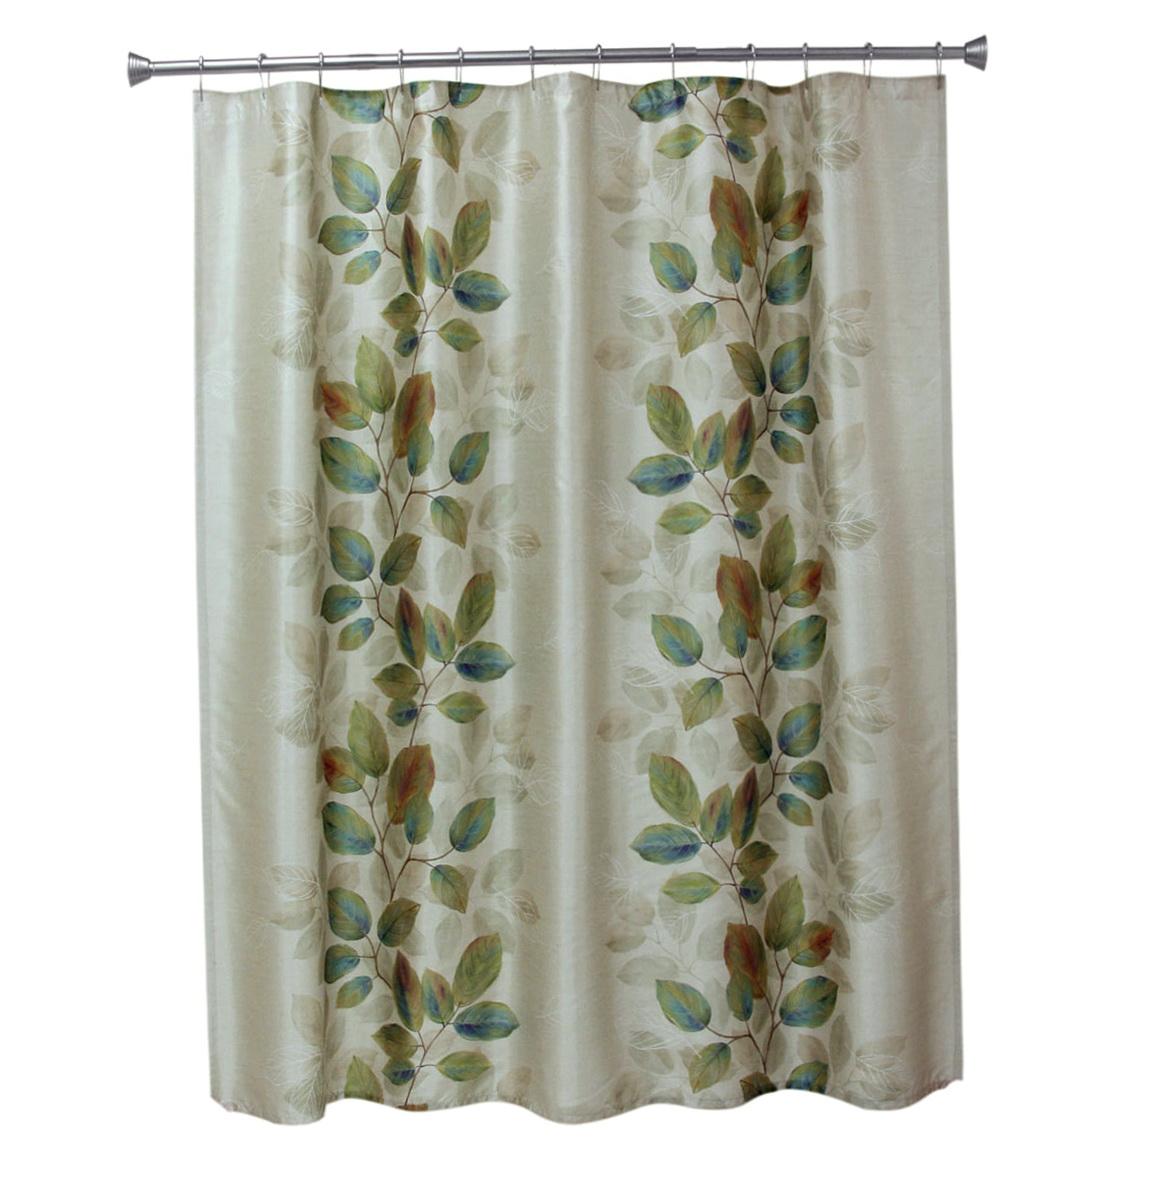 Fall Shower Curtains Accessories Home Design Ideas